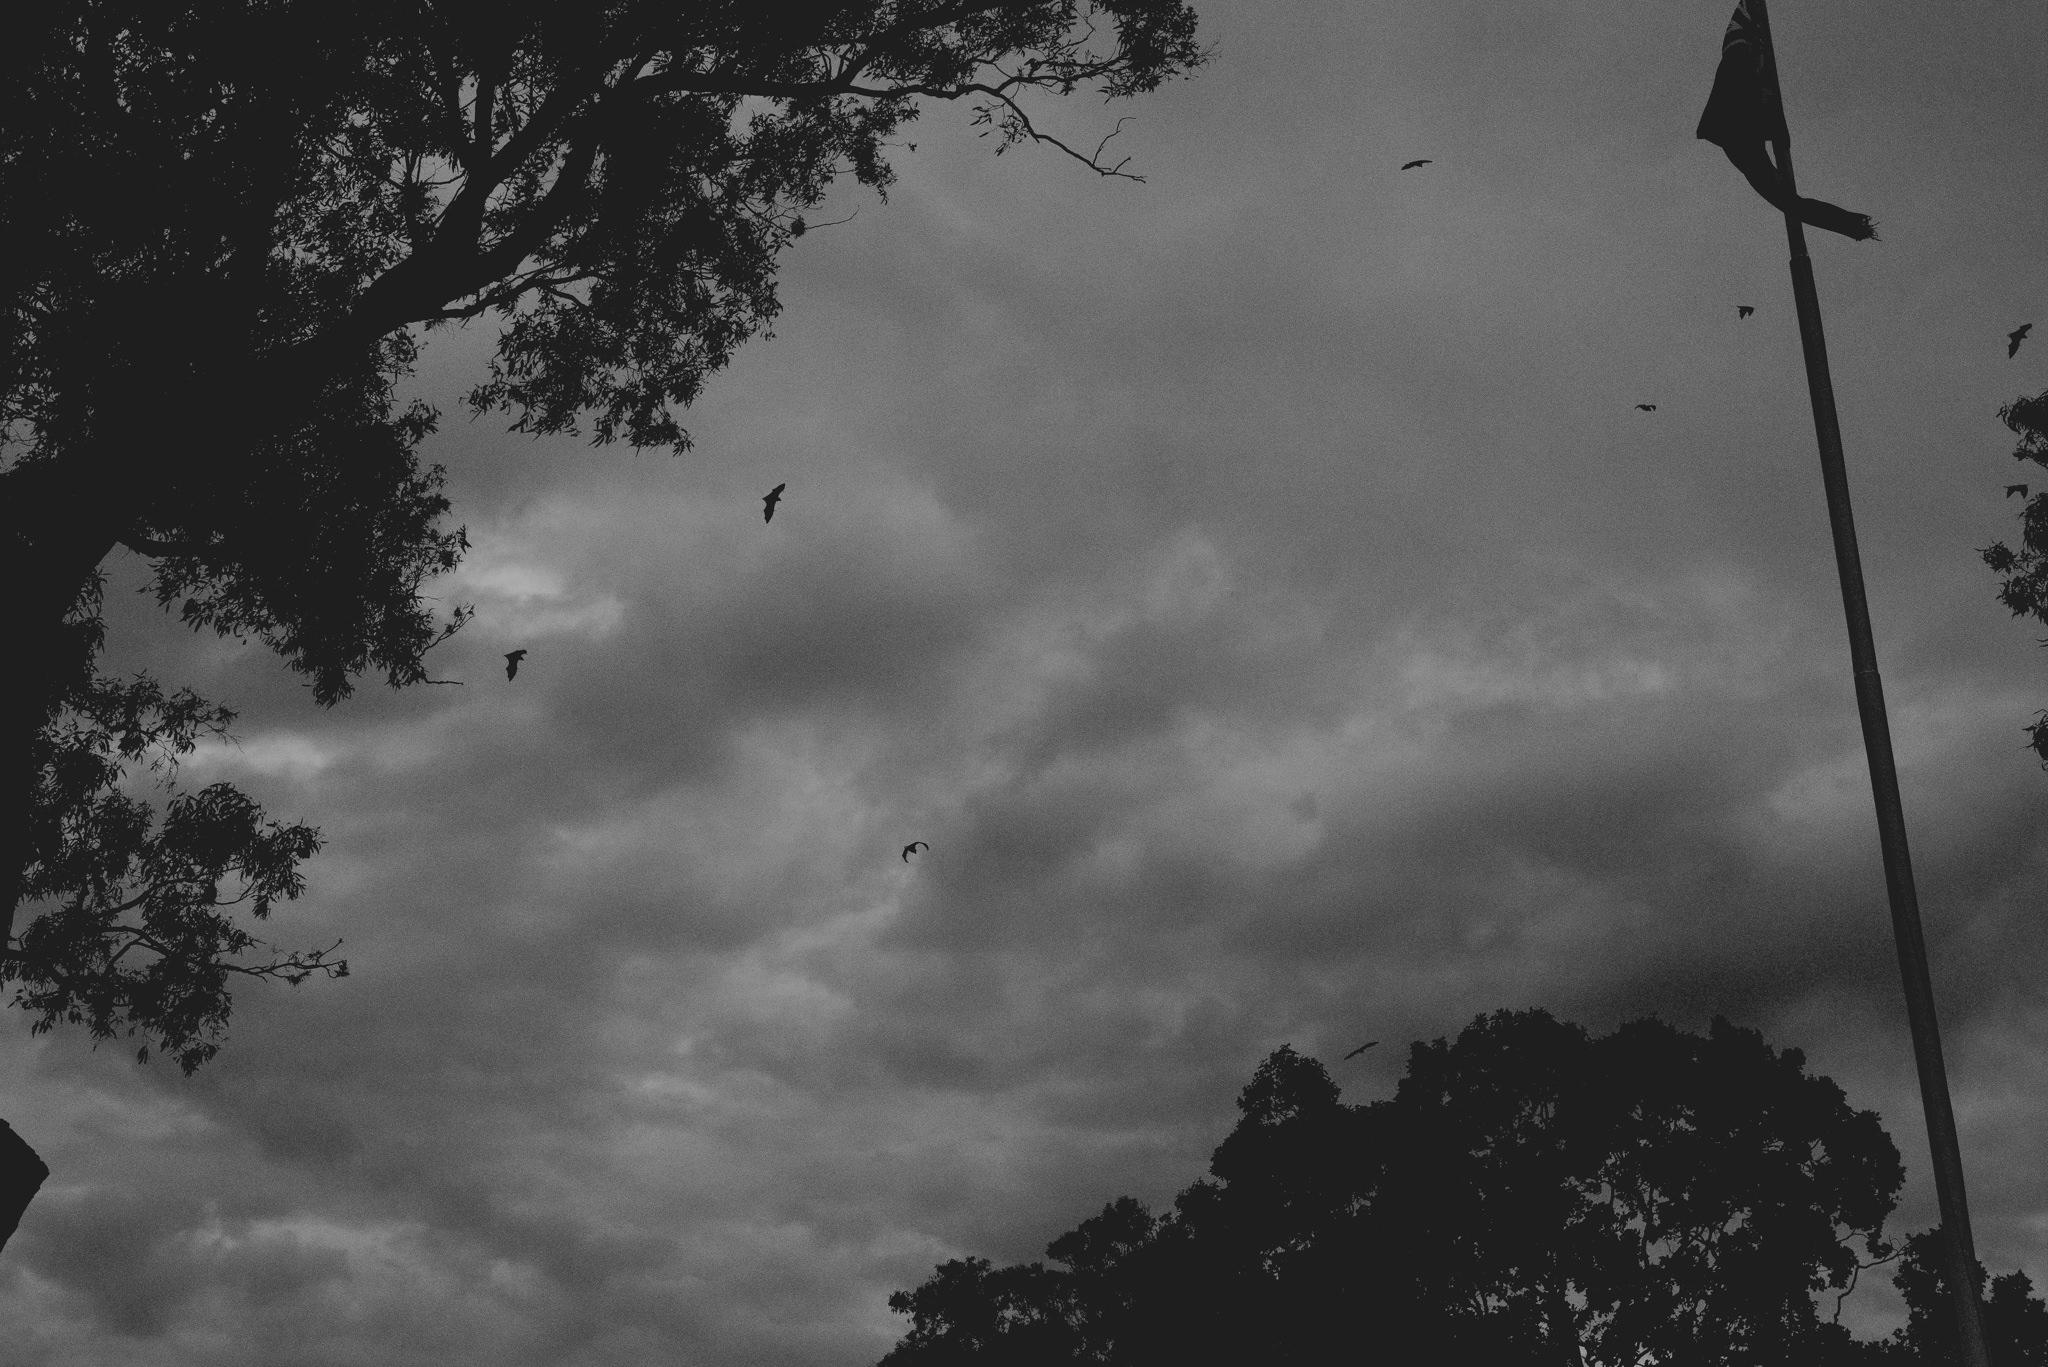 Bats flying across a dark and cloudy sky